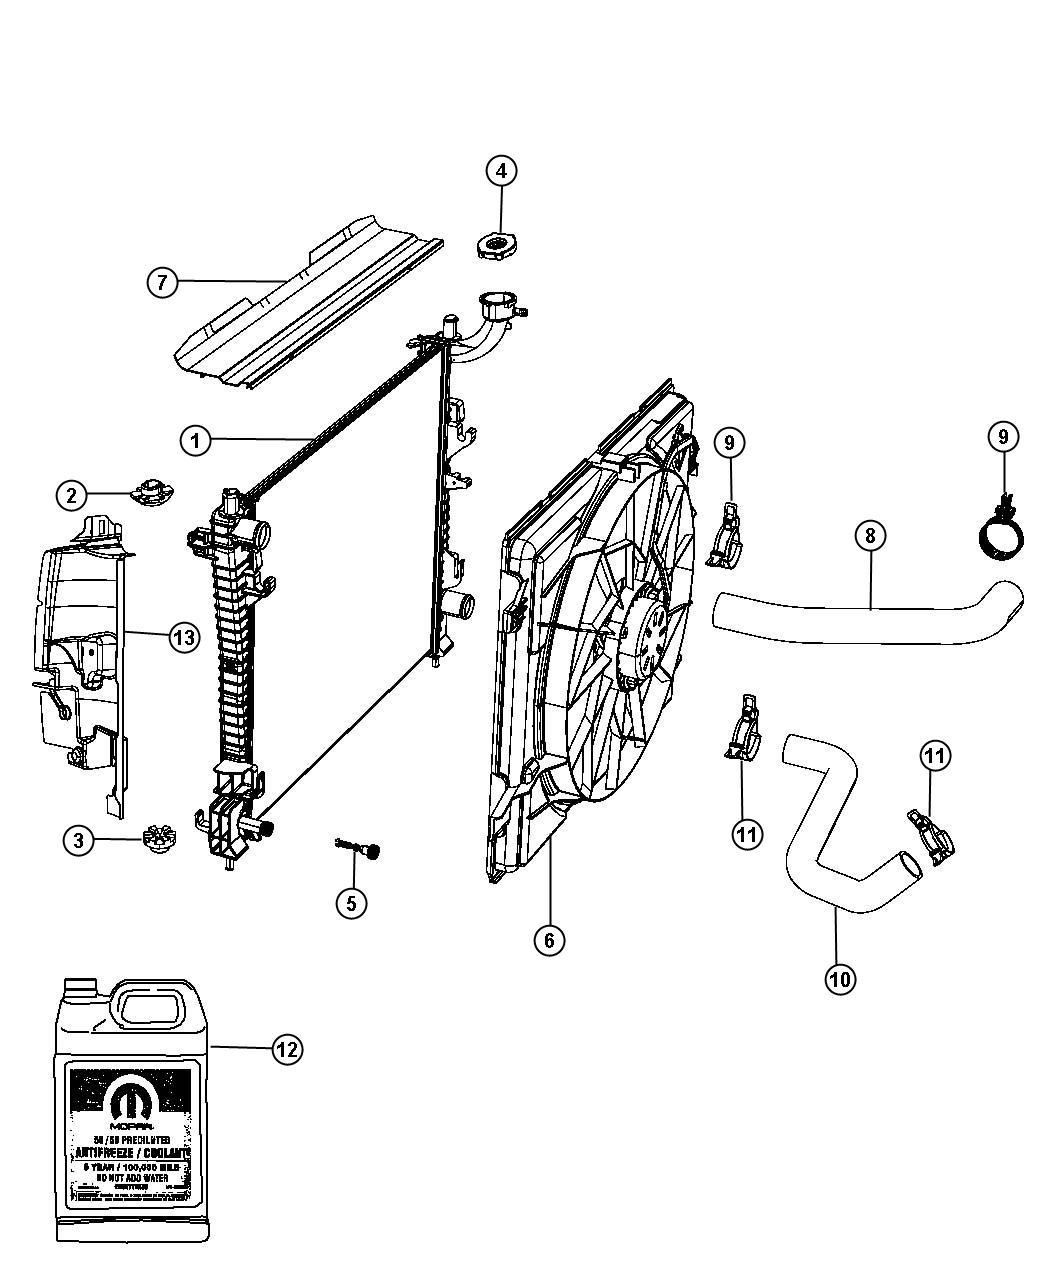 2013 Dodge Dart Fog Lamps Wiring Diagram - Wiring Diagrams on